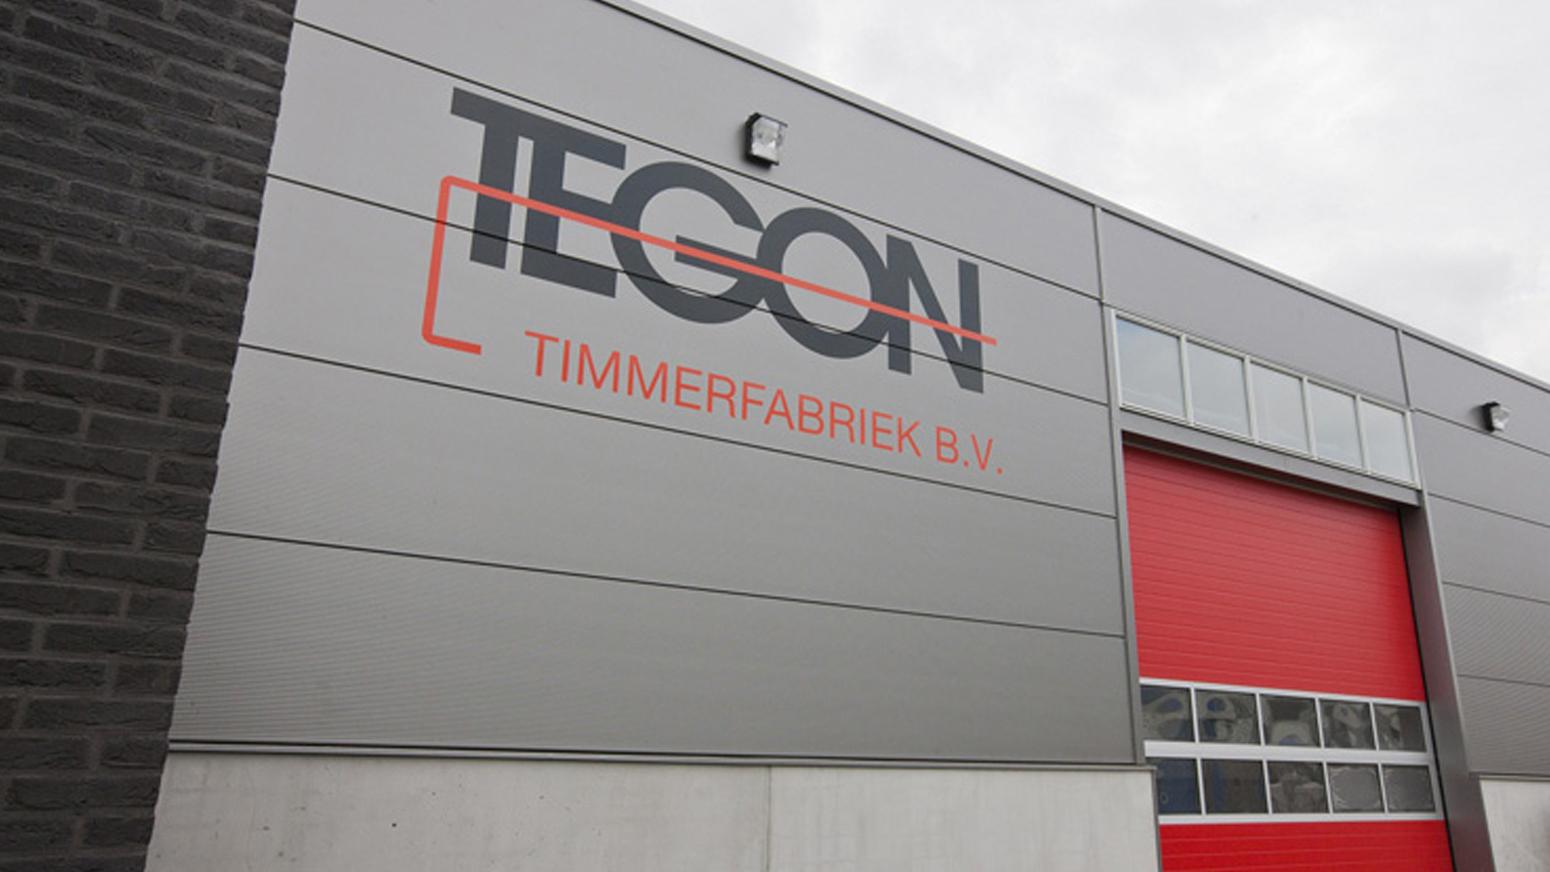 Buitenzijde gebouw Tegon Timmerfabriek BV